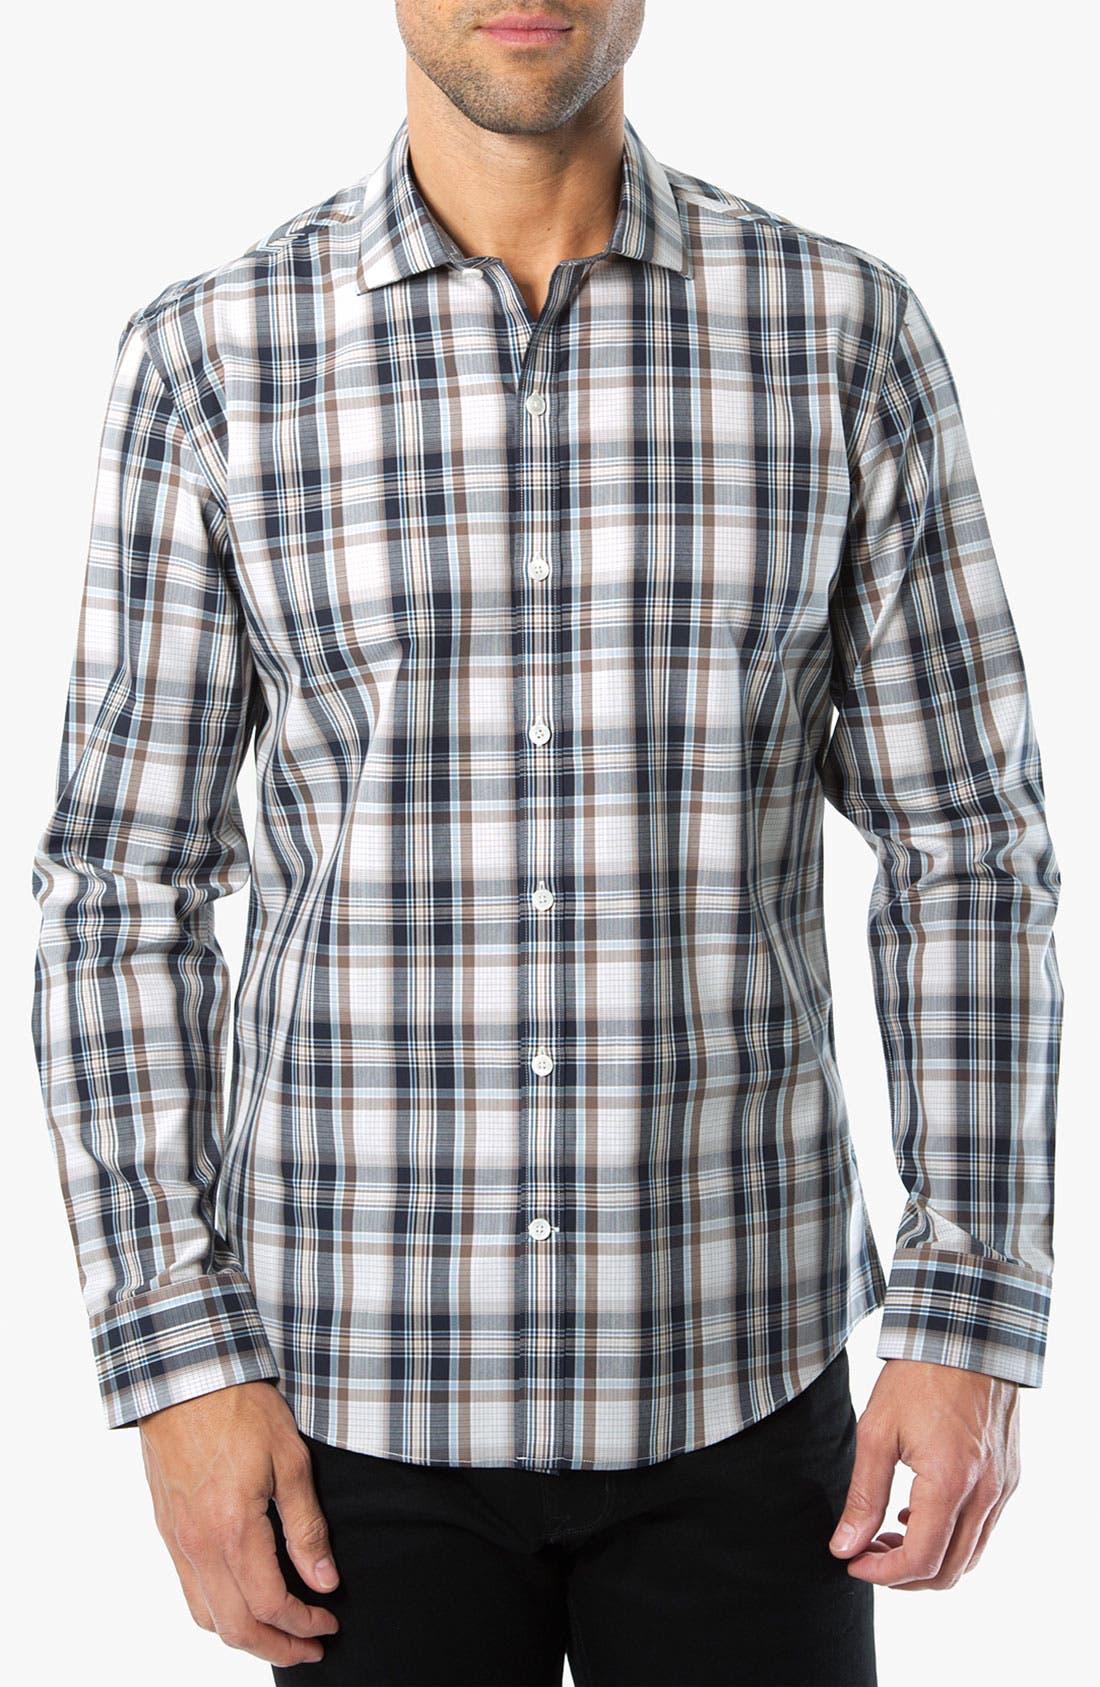 Alternate Image 1 Selected - Kenson 'High Noon' Plaid Woven Shirt